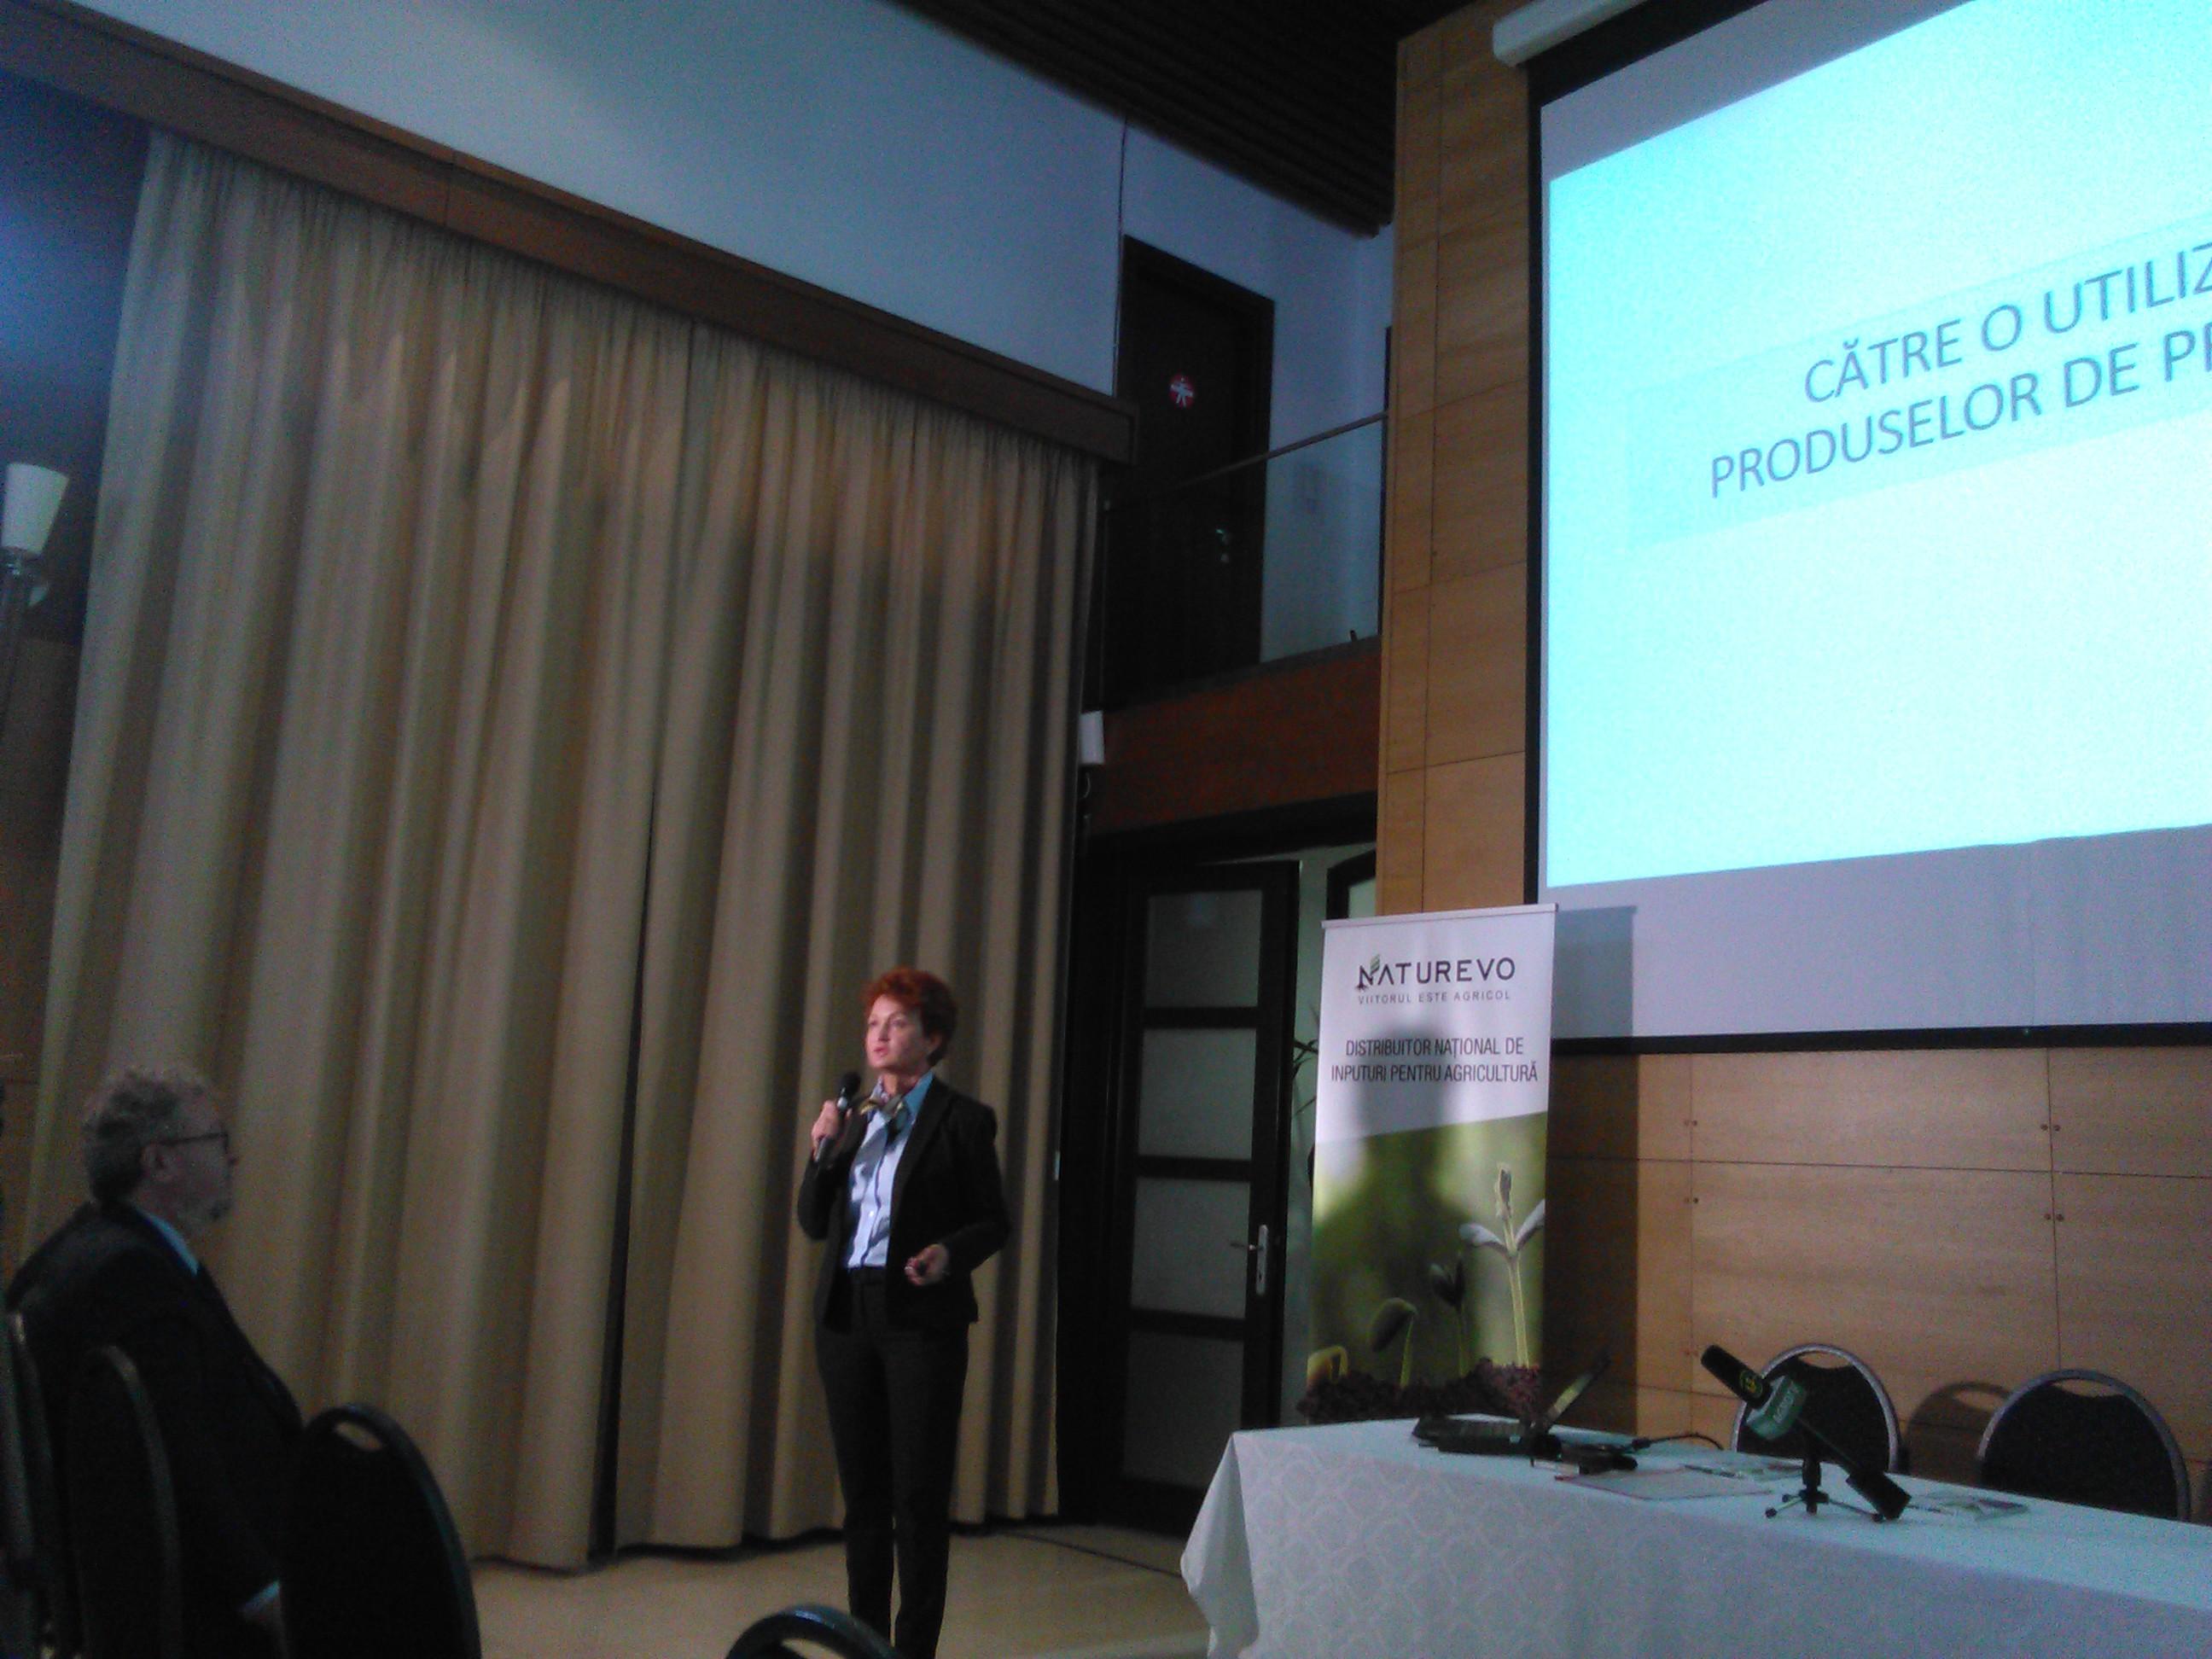 Elena Leaota: Pesticidele trebuie sa aiba efecte secundare minime asupra sanatatii umane si a mediului